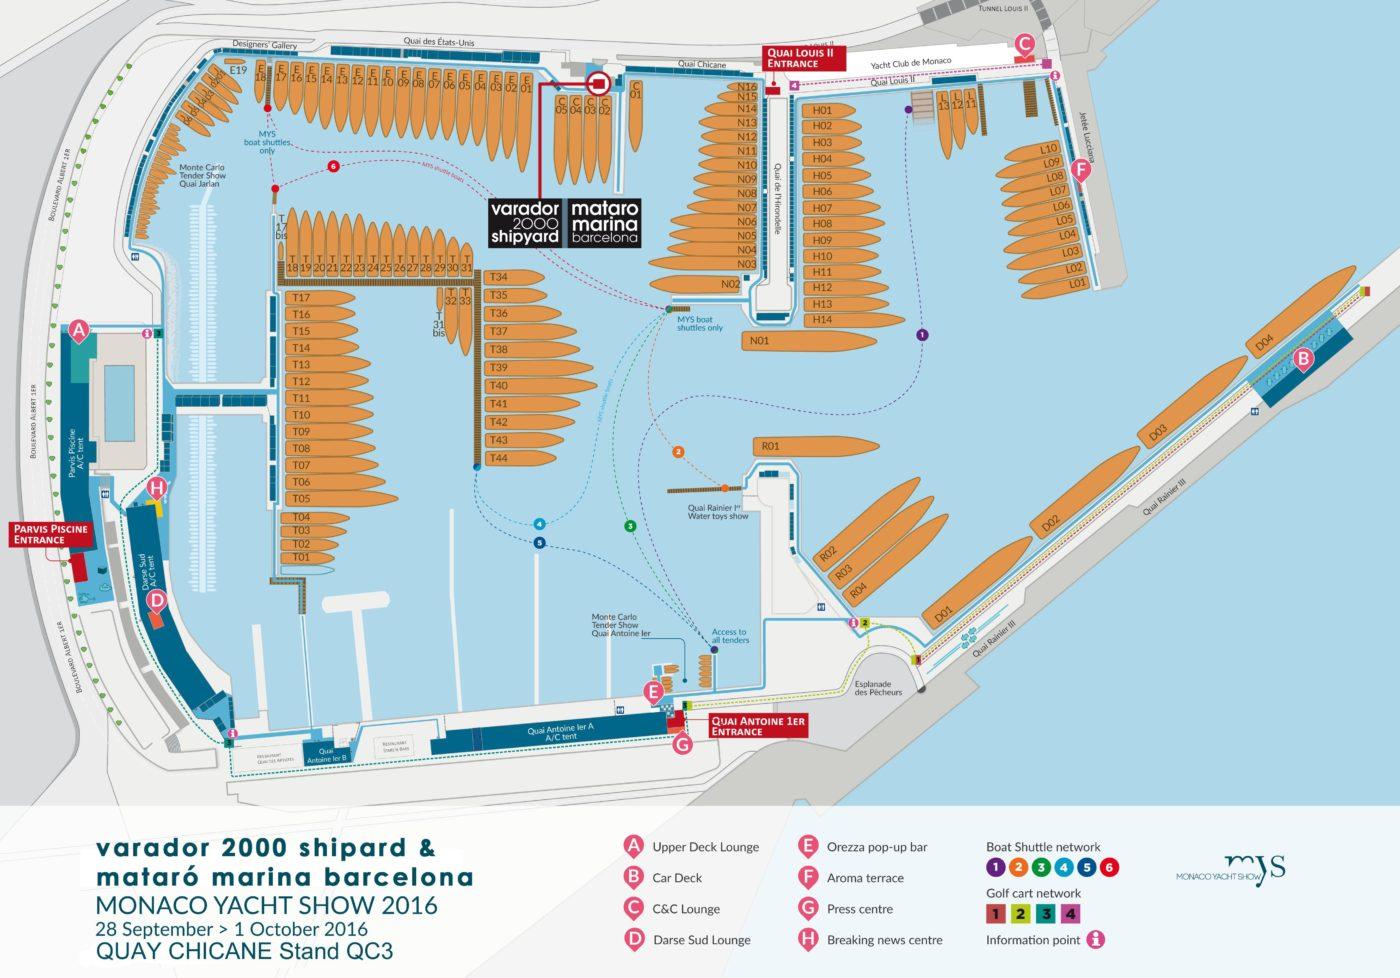 Varador 2000 promote base for superyachts Mataró Marina Barcelona in Monaco Yacht Show